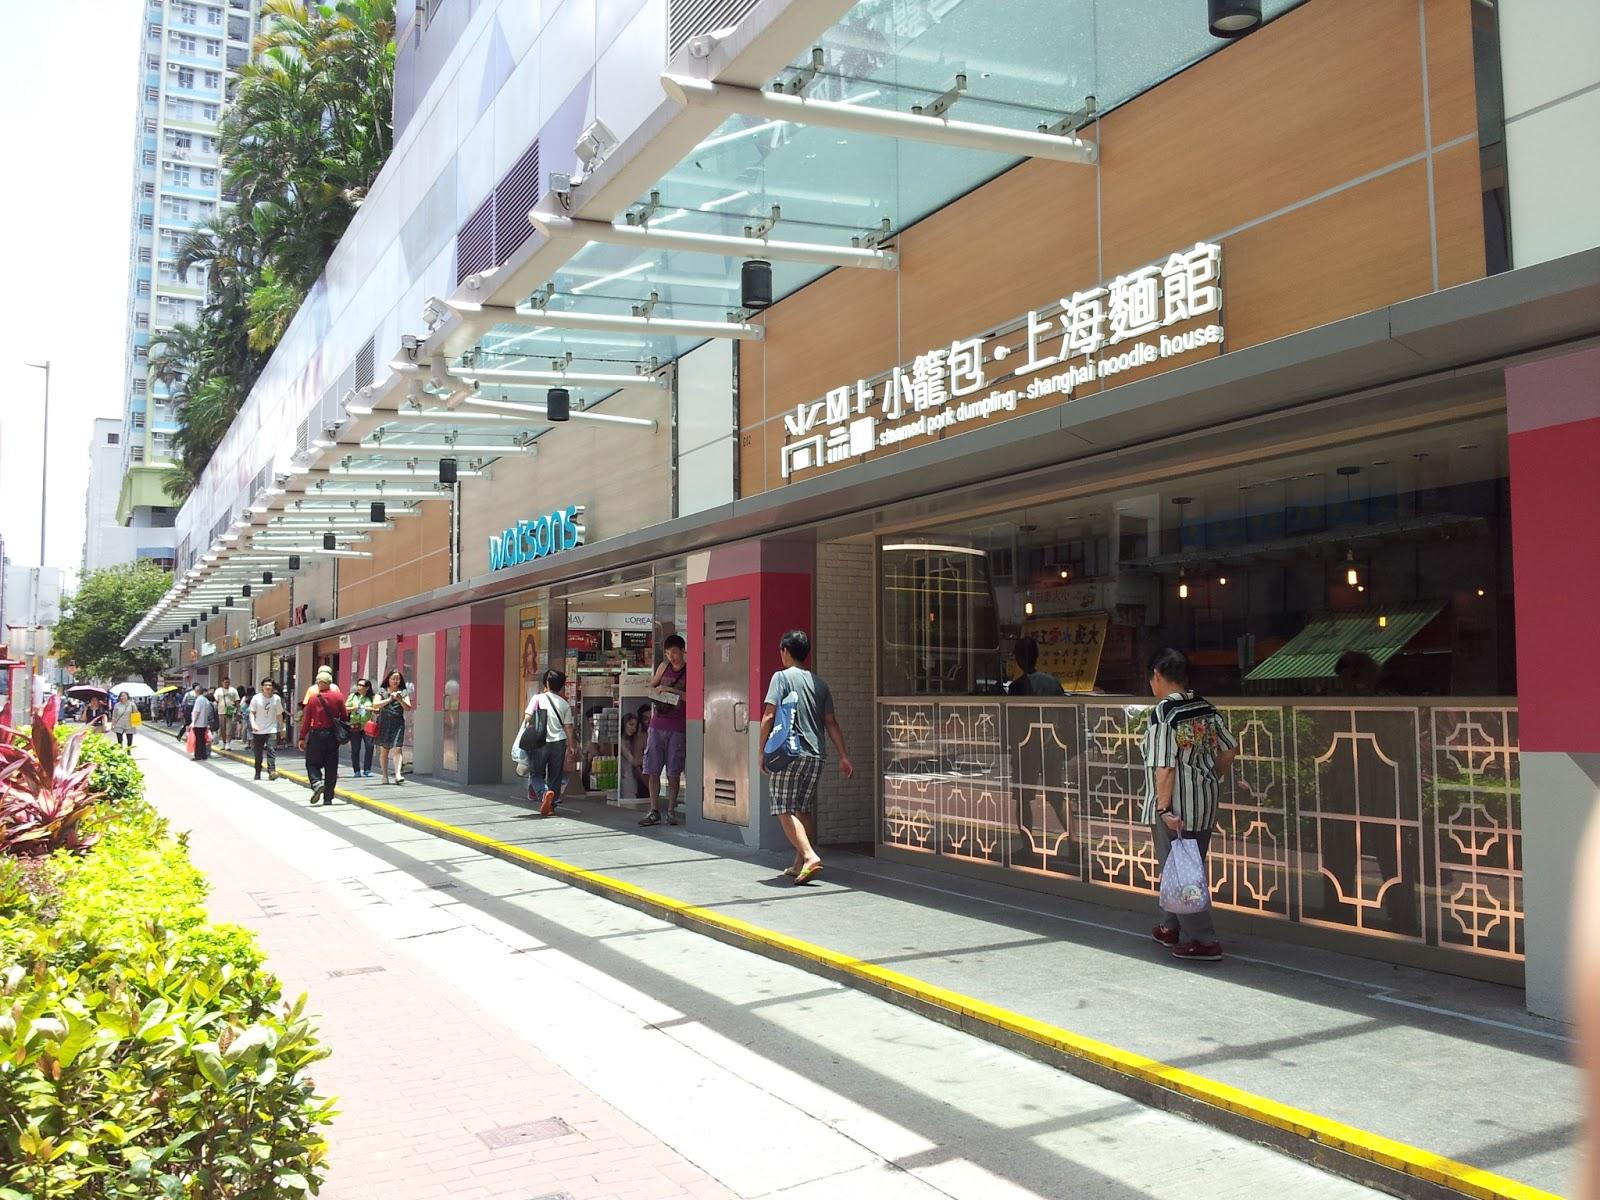 Grassroots O2: [領匯商場] 元州商場 @2015-06-06